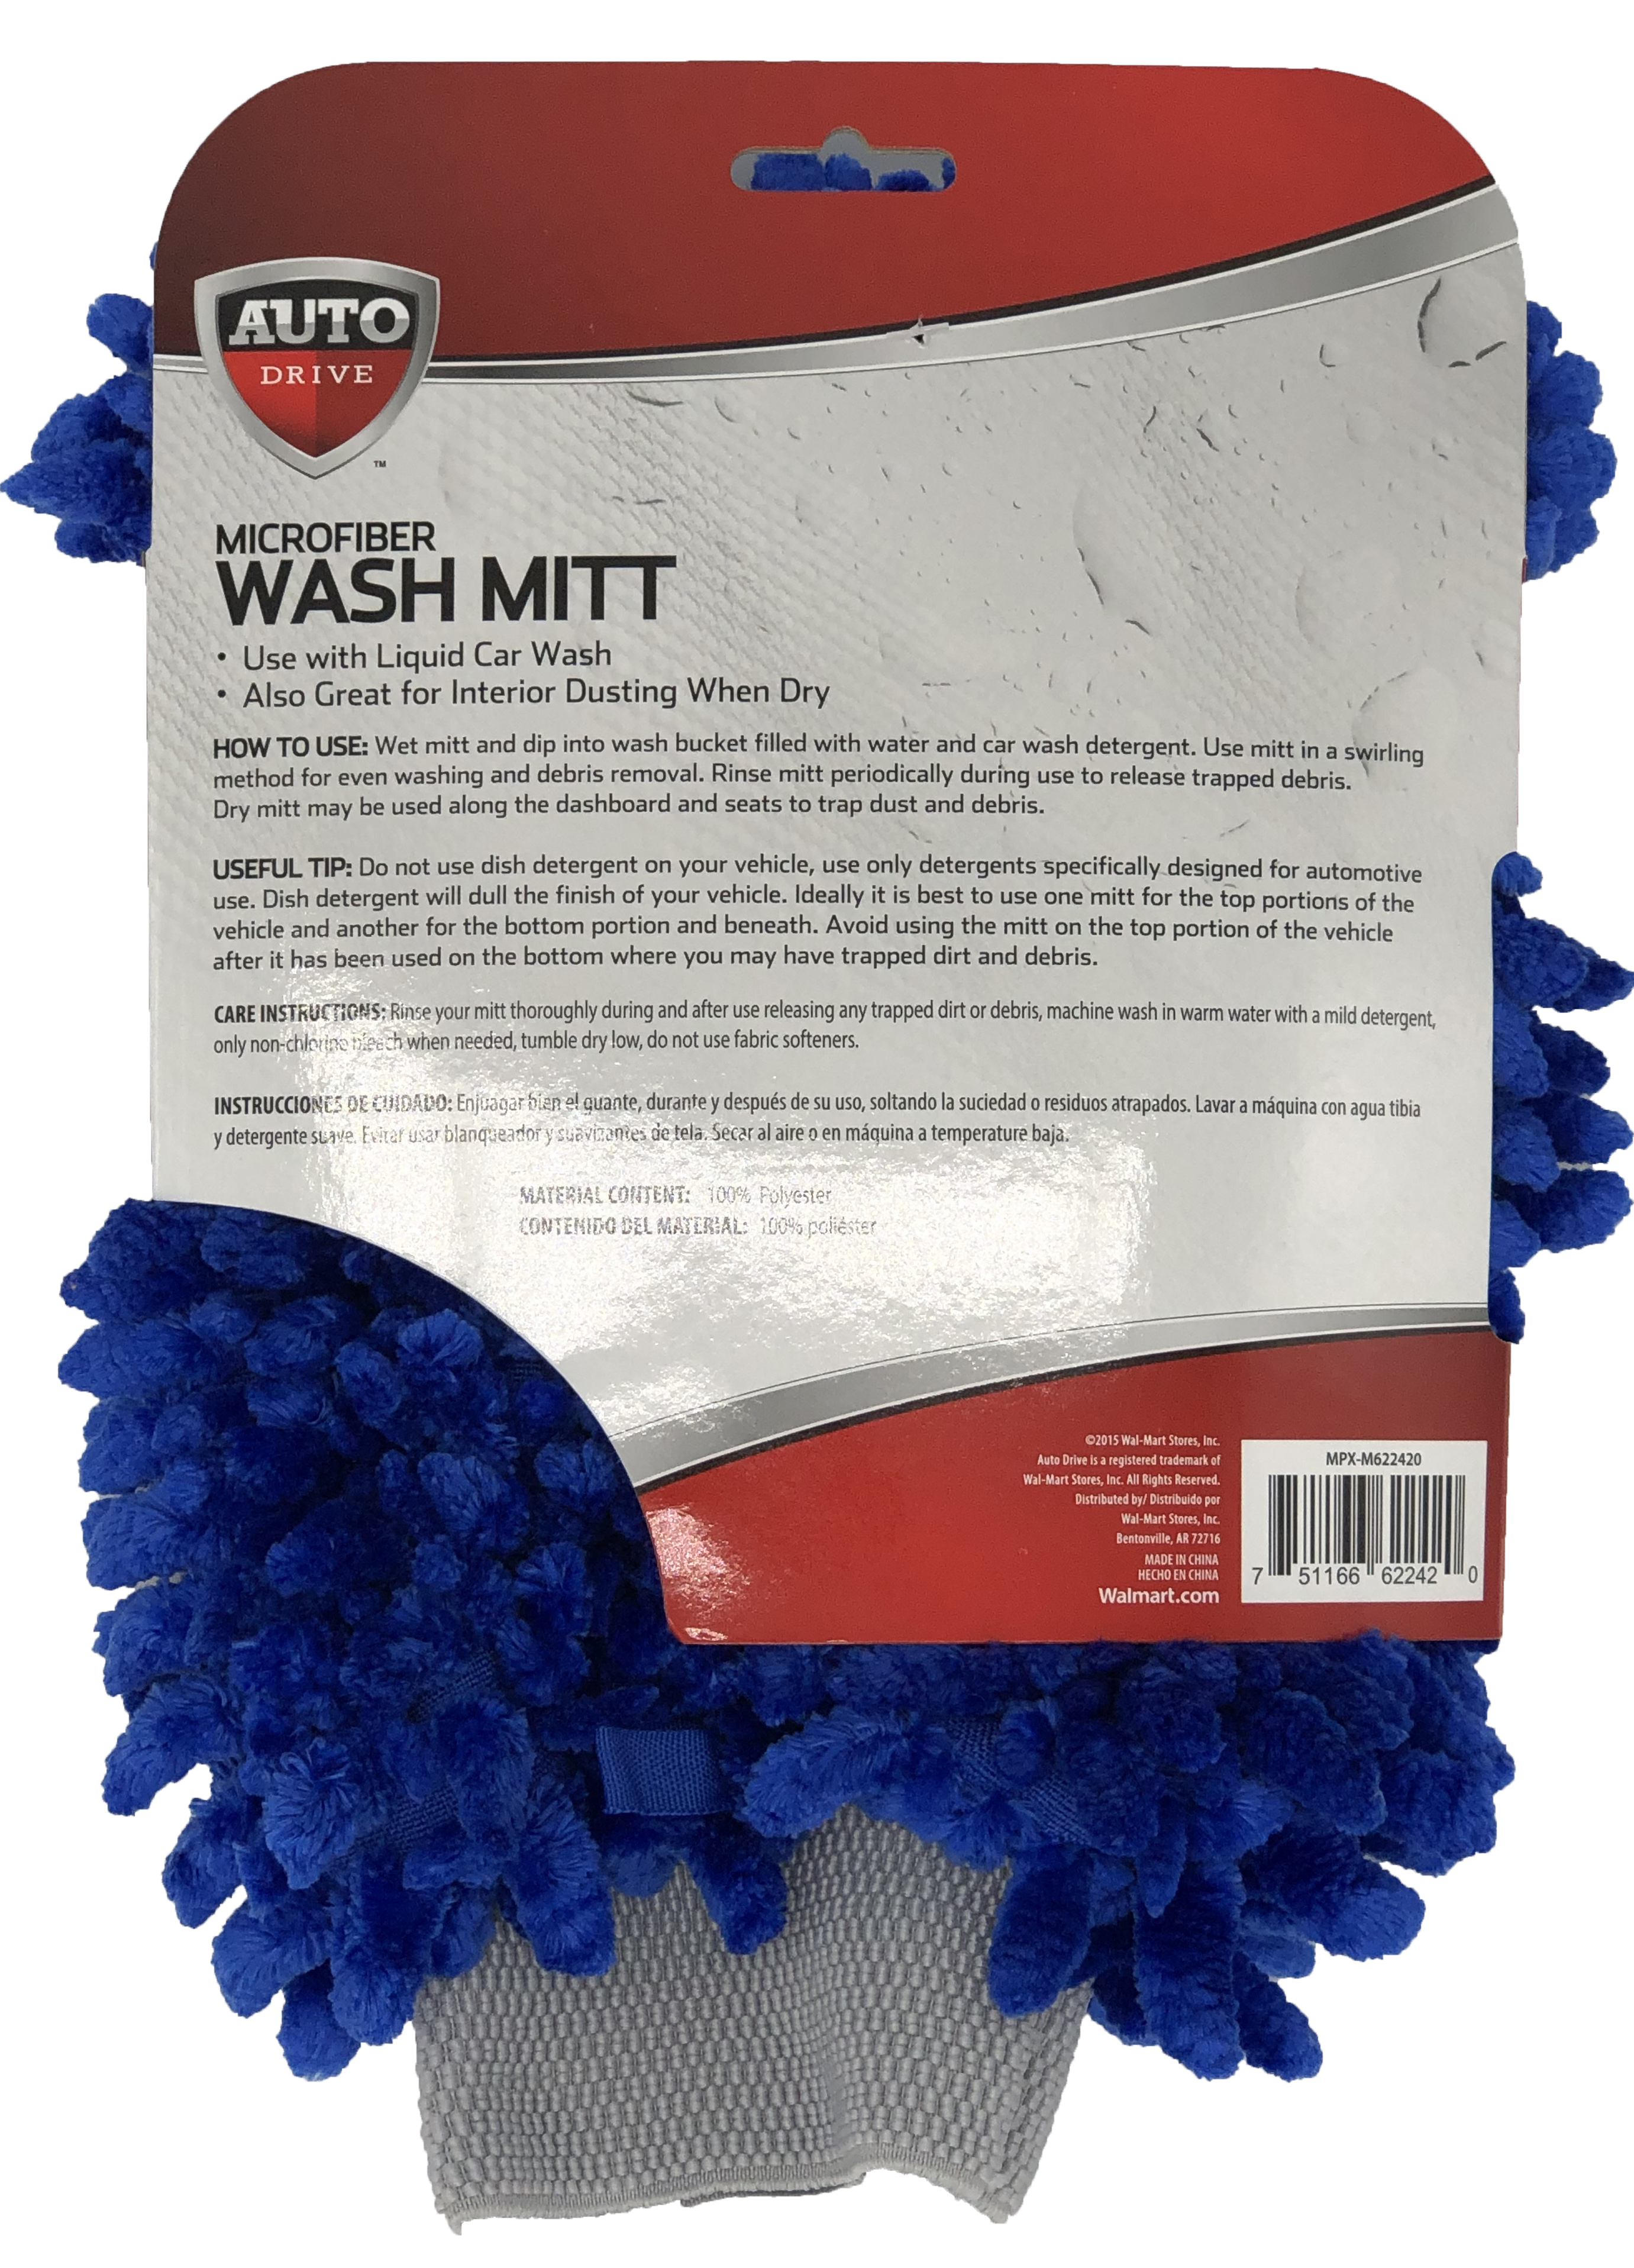 Auto Drive Microfiber Wash Mitt Walmart Com